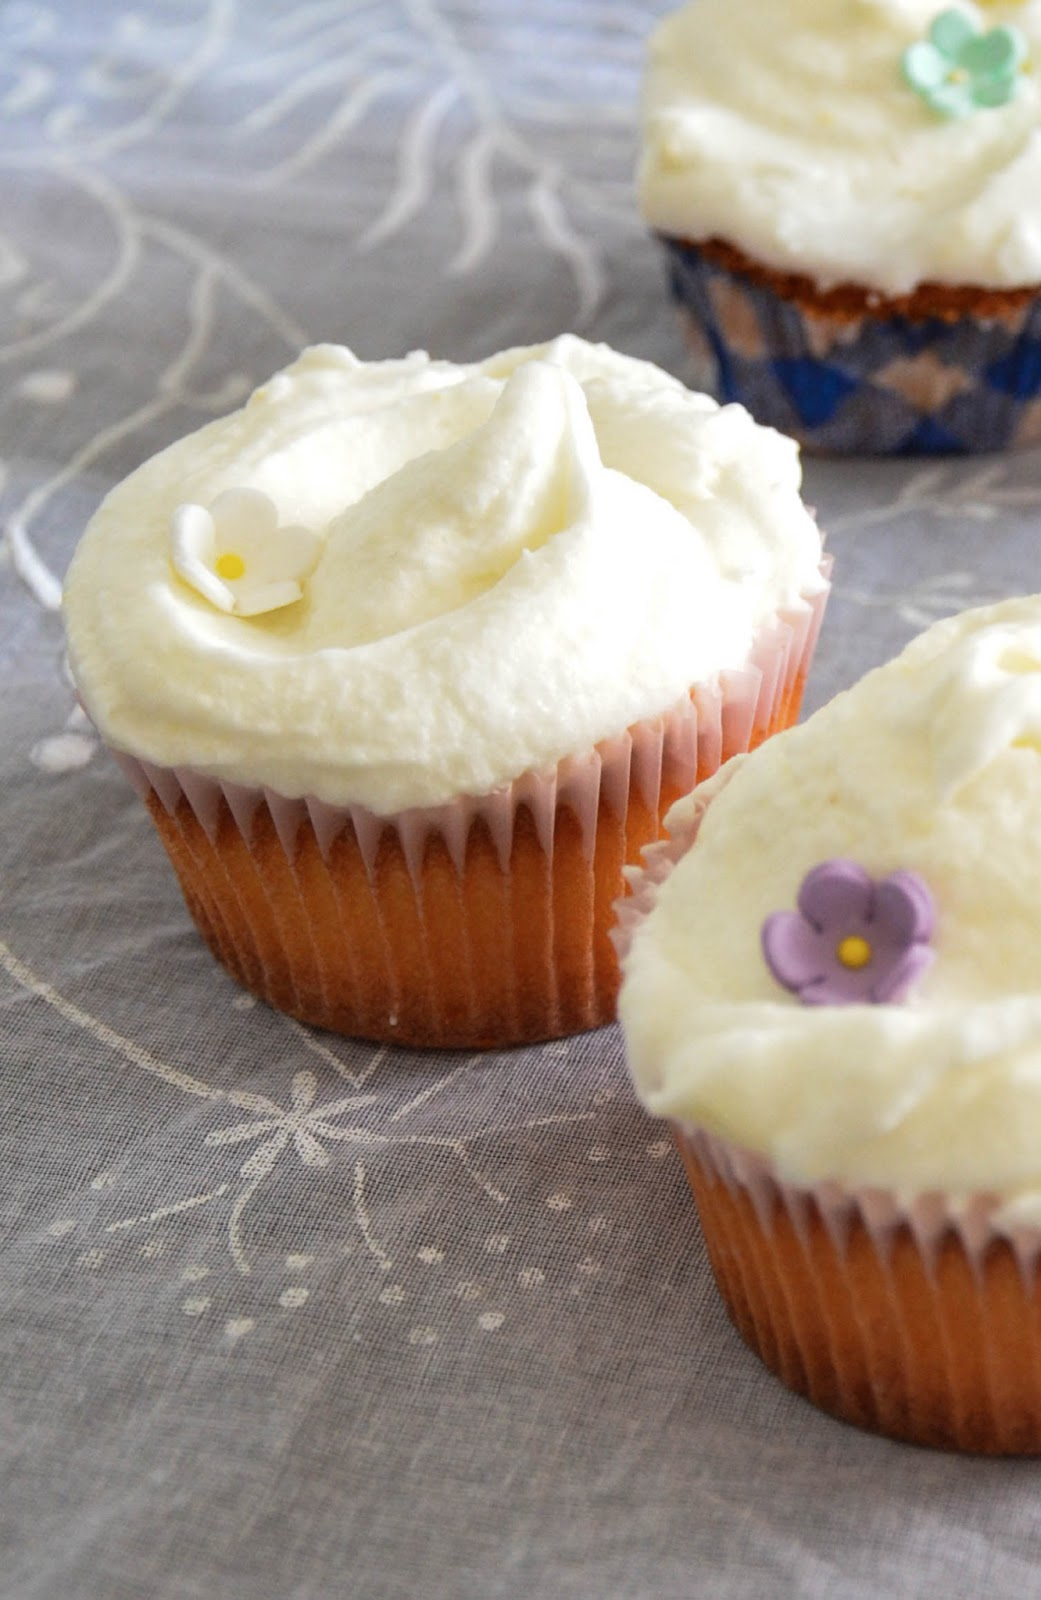 cupcakes al limone (versione magnolia bakery)